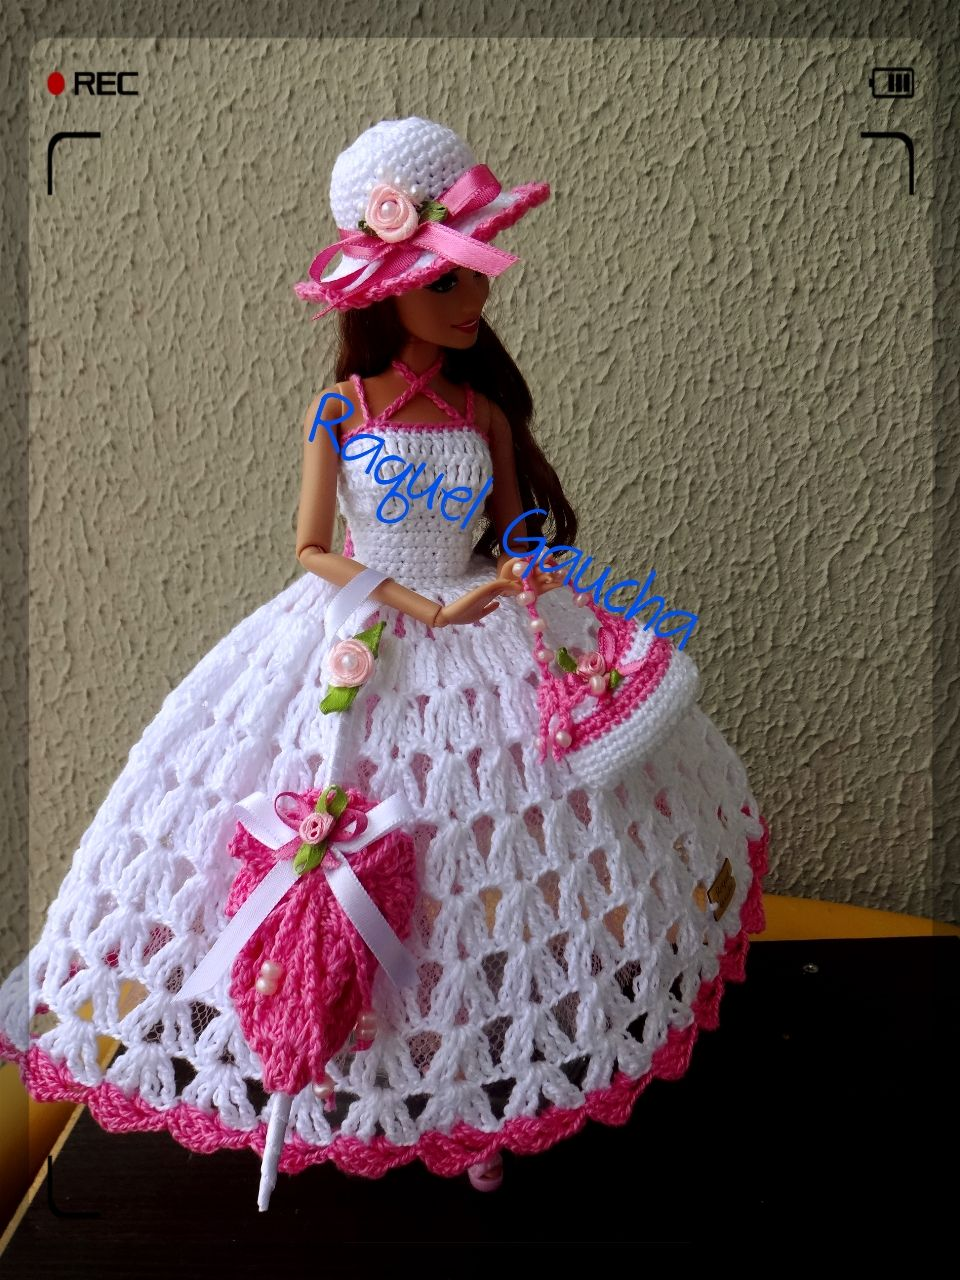 Cléa5 #crochet #Vestido #Muñeca #Dress #Hat #Chapéu #Sombrero #Bolsa ...